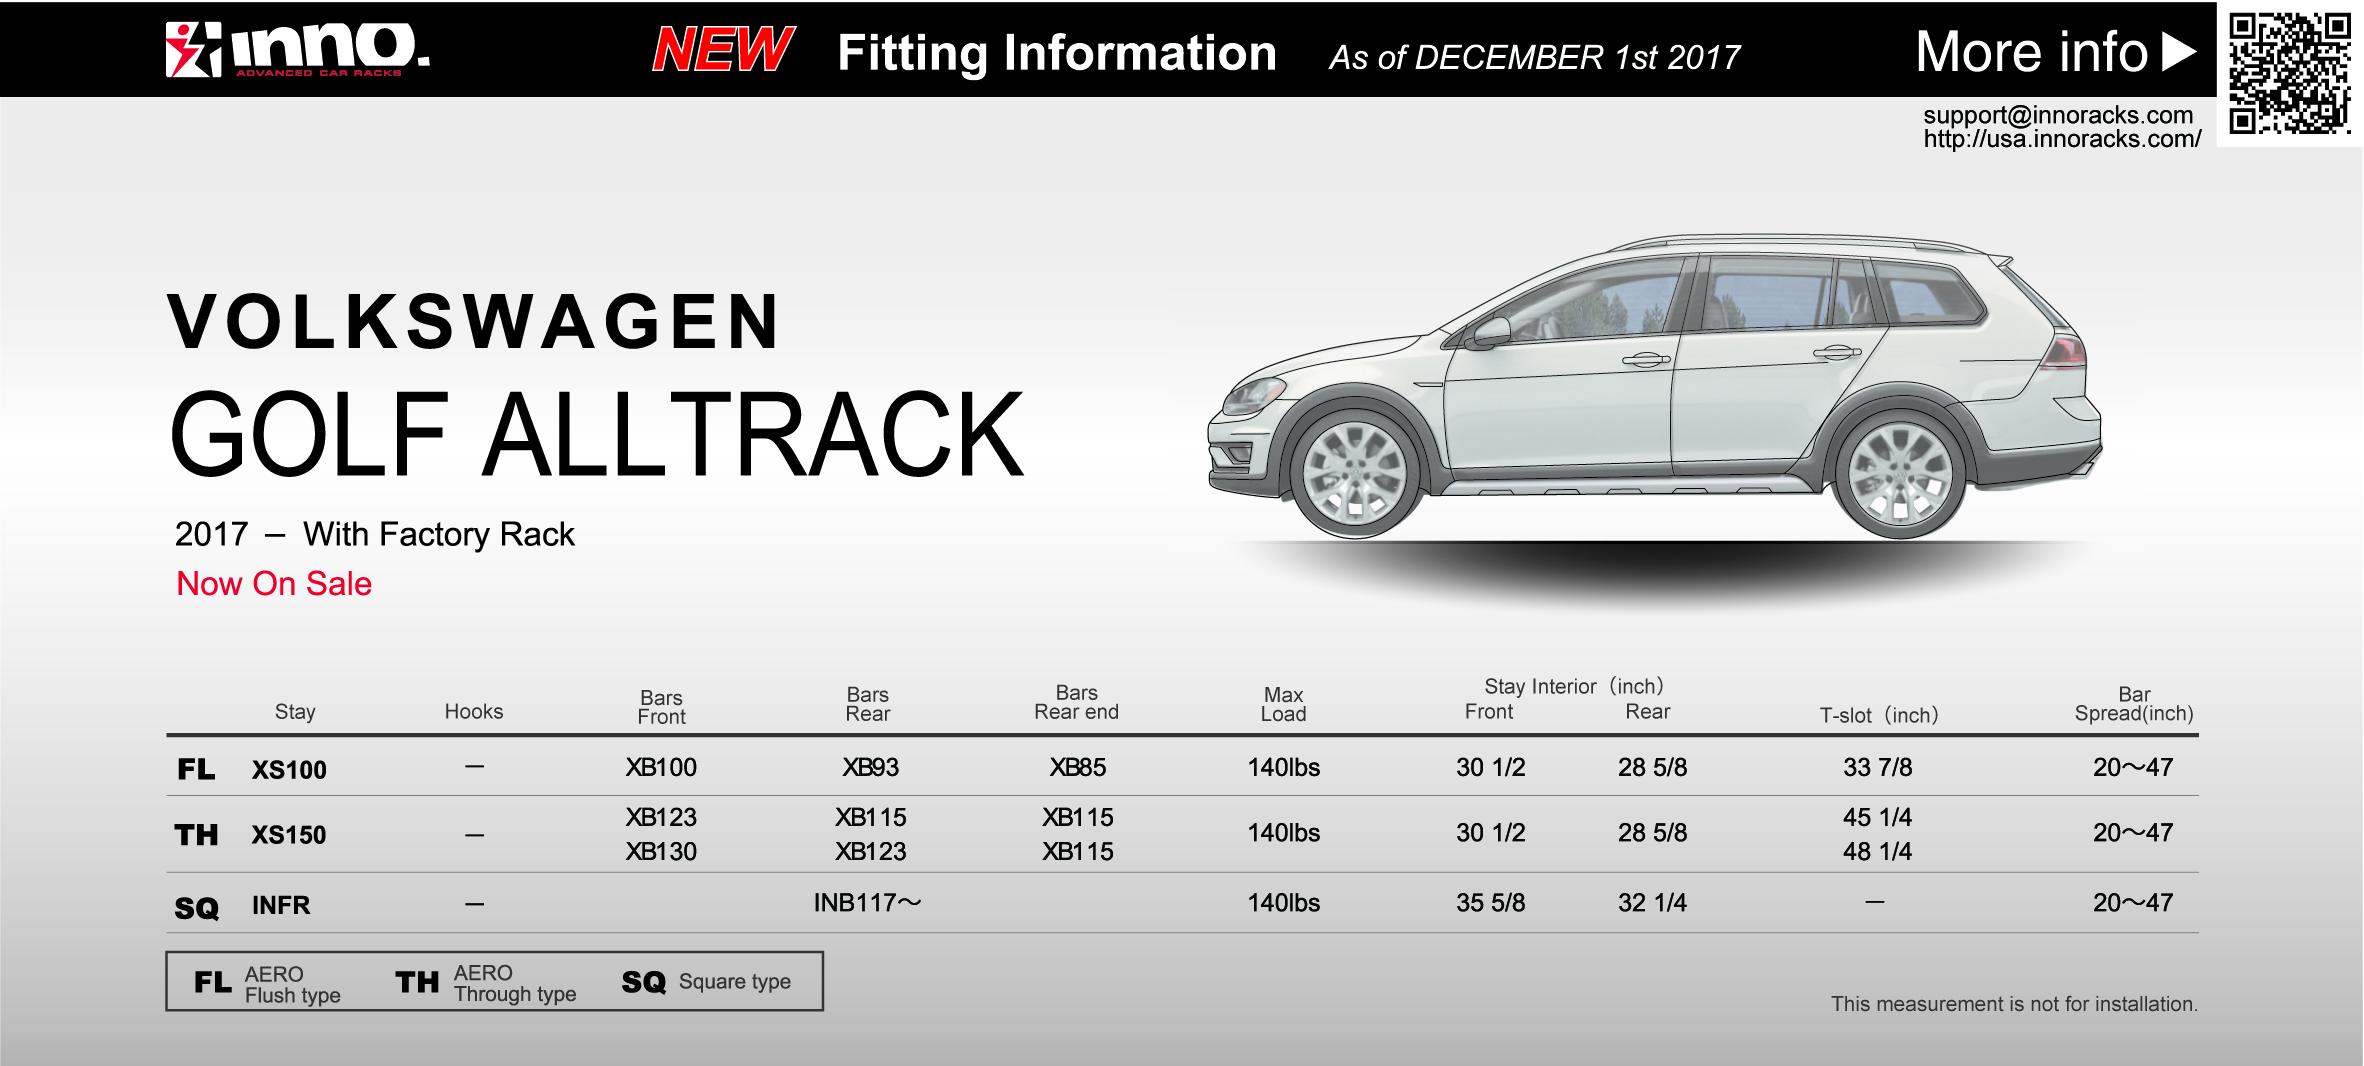 2017 Volkswagen Golf All Track